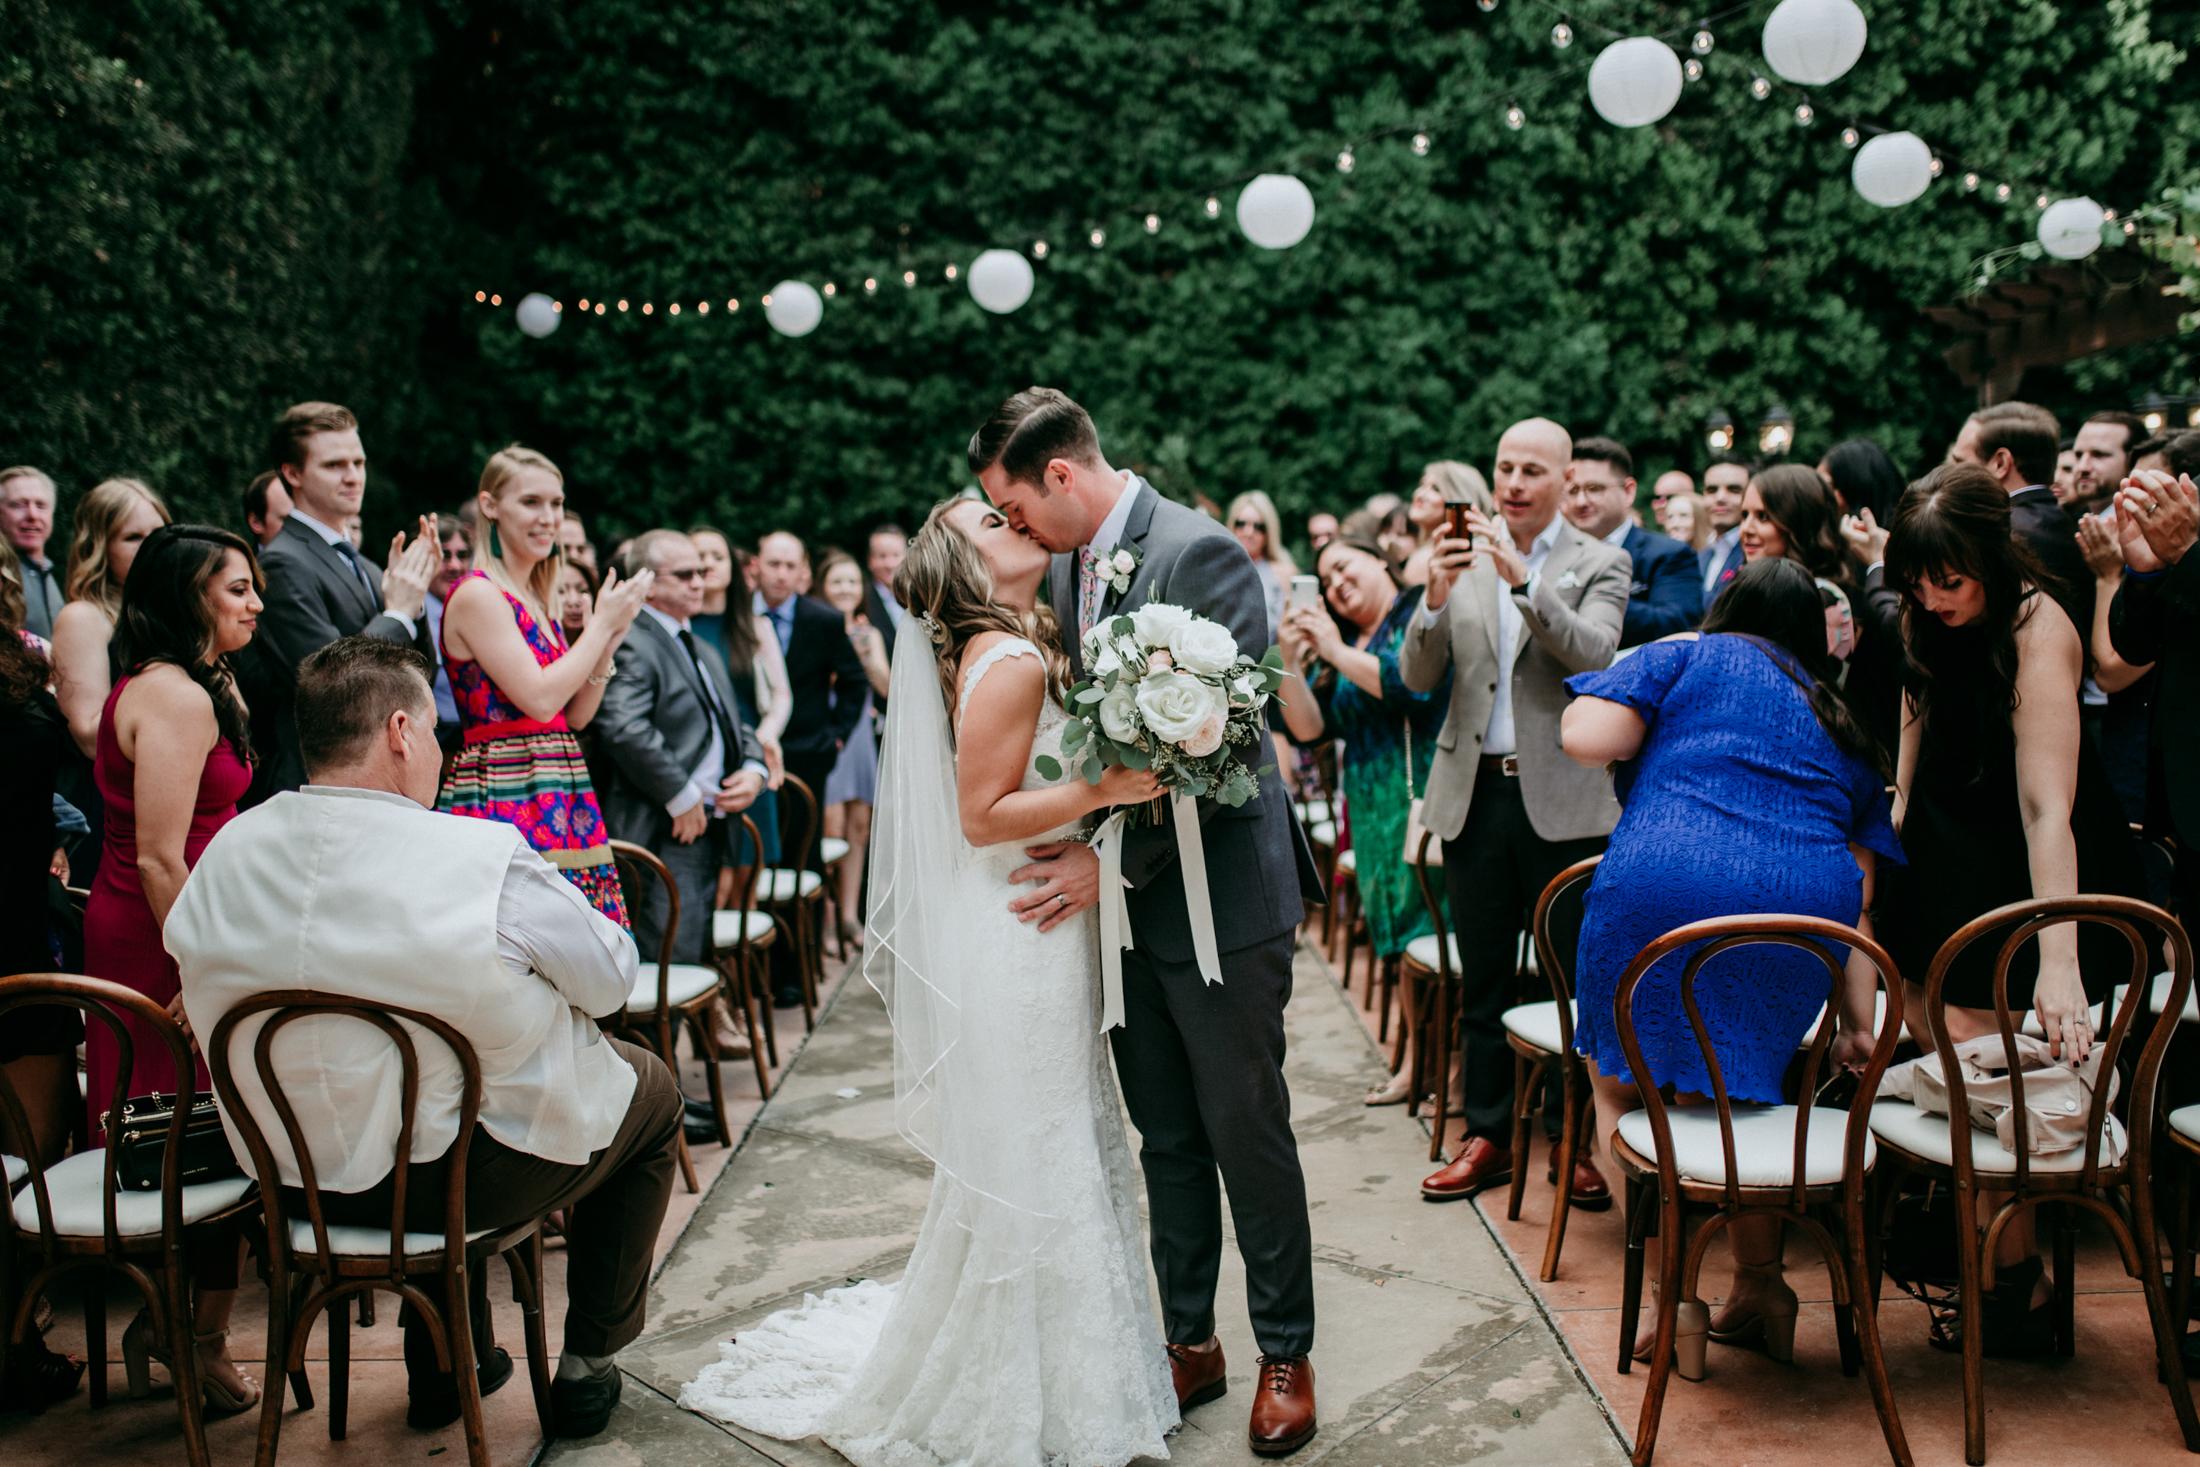 franciscan_garden_wedding-46.jpg